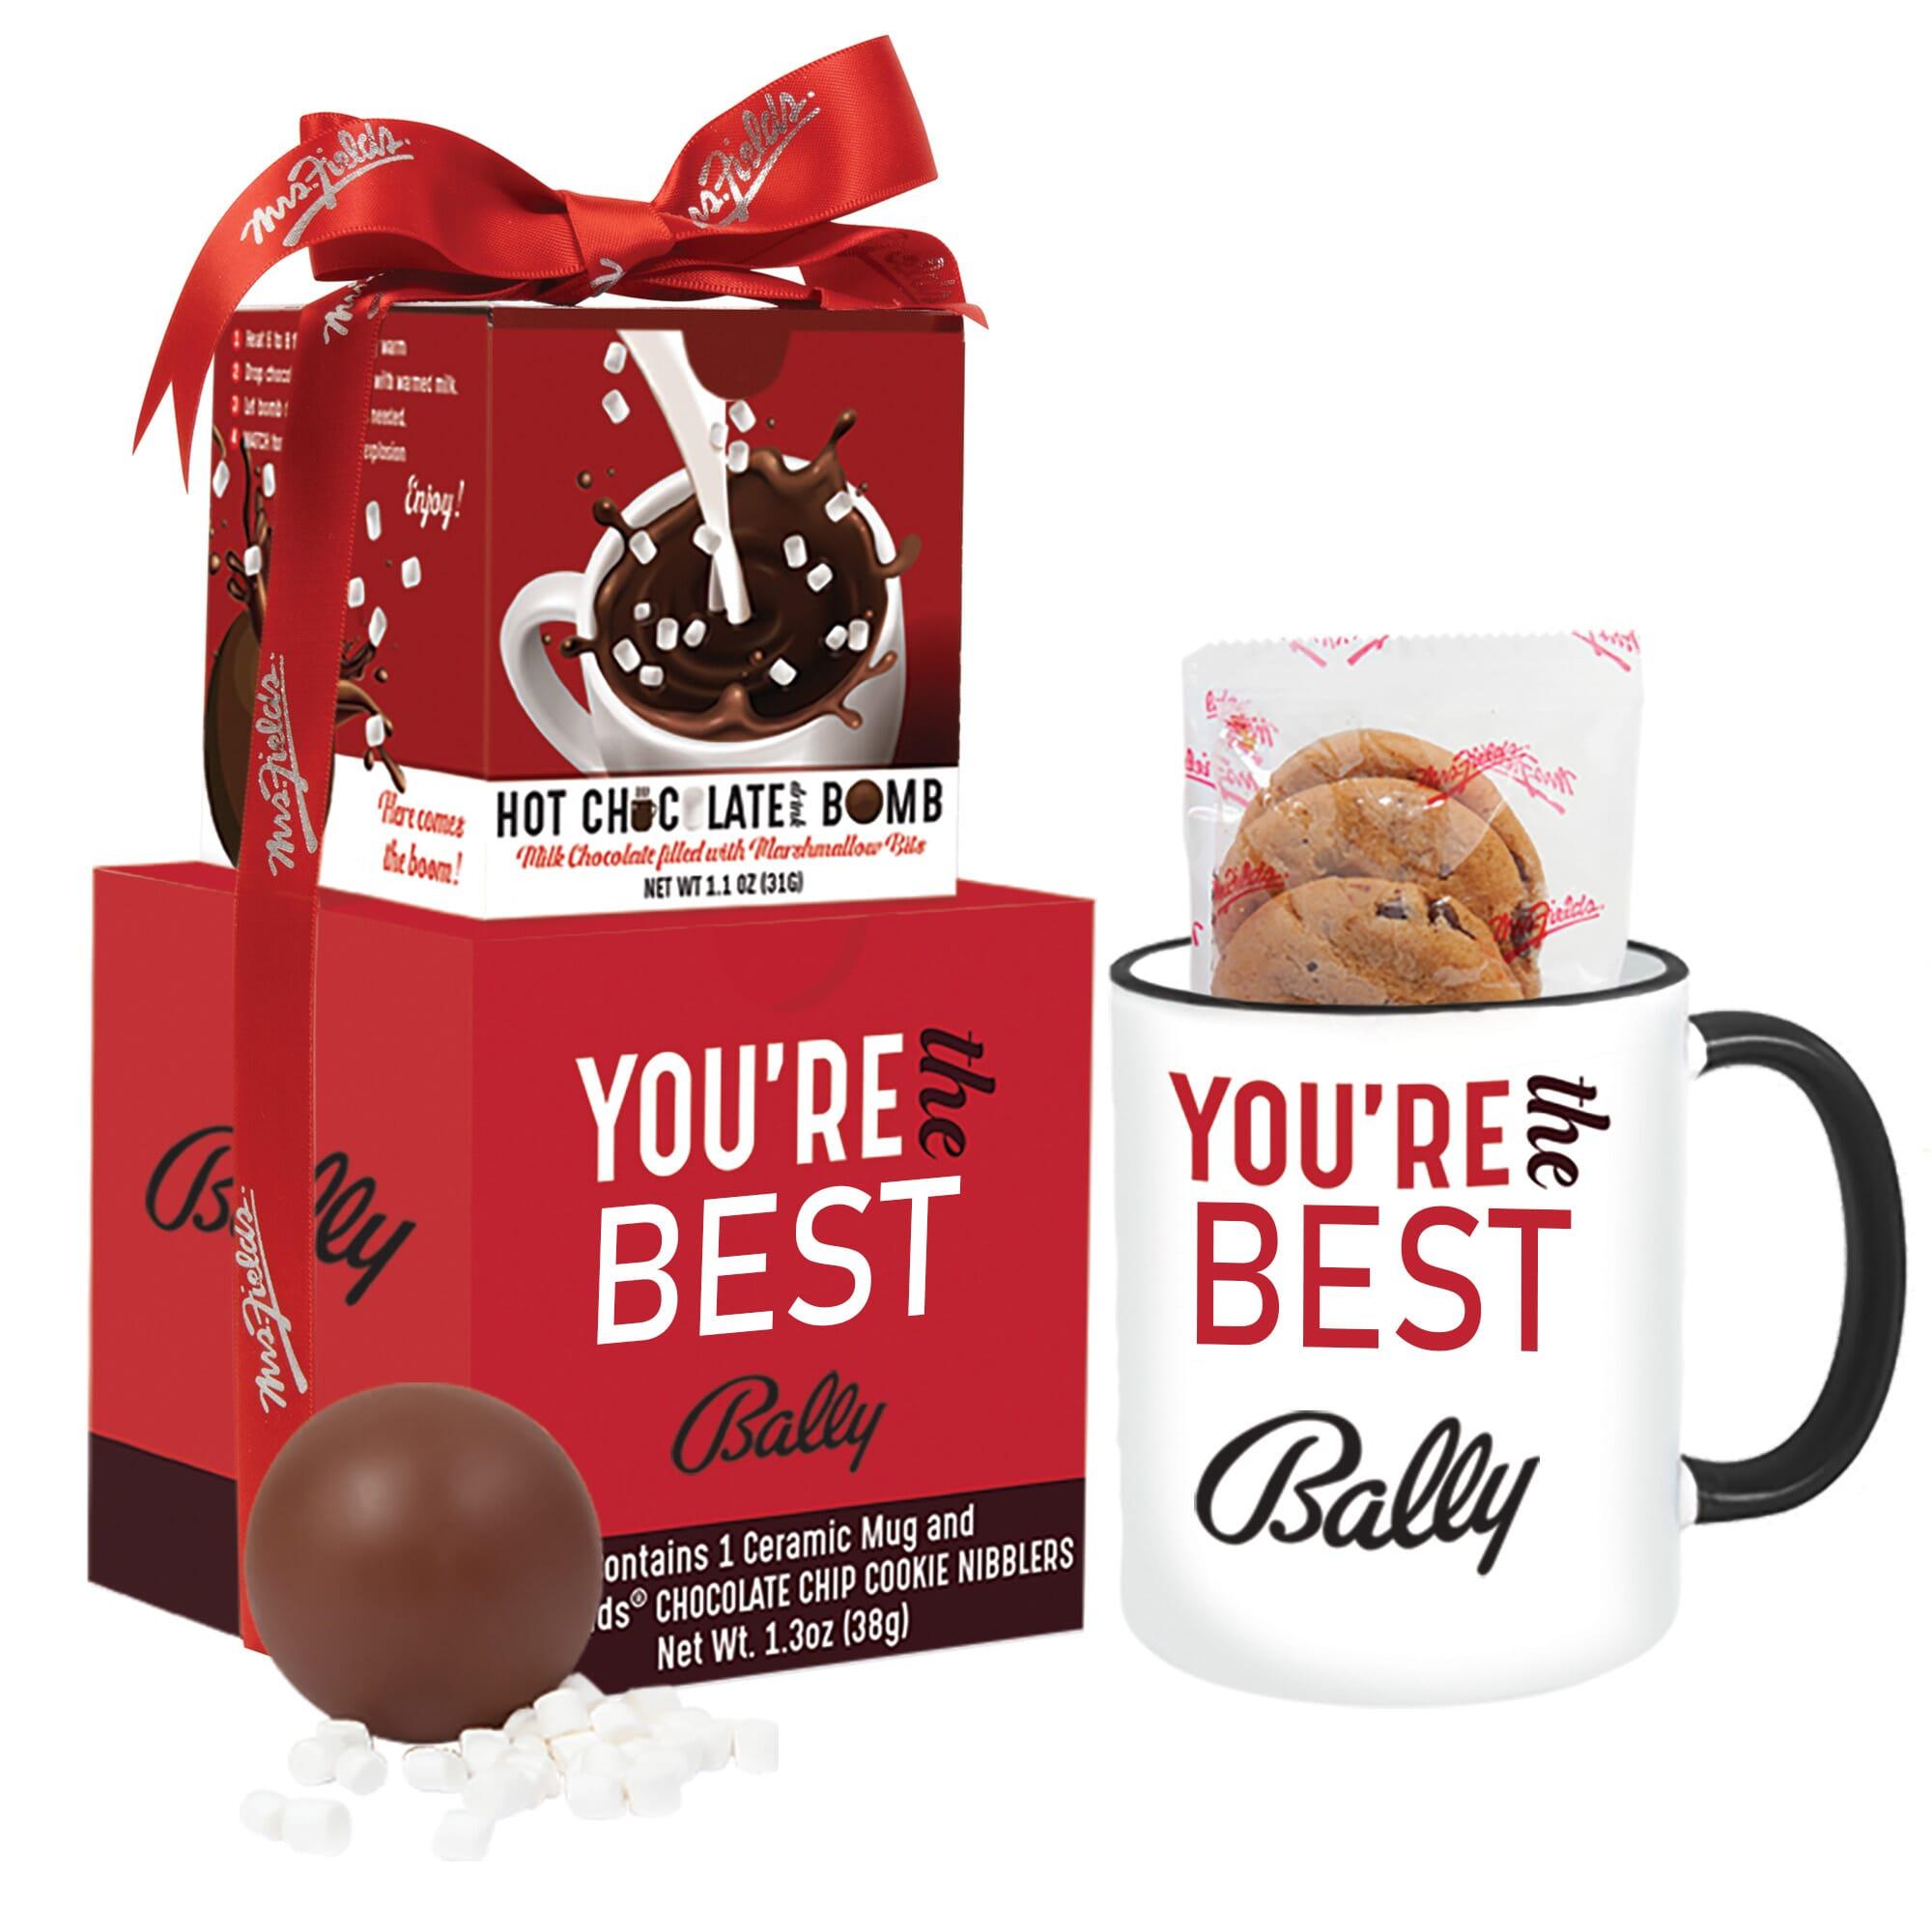 Mrs. Fields Mug & Cookies with Hot Chocolate Bomb Gift Set